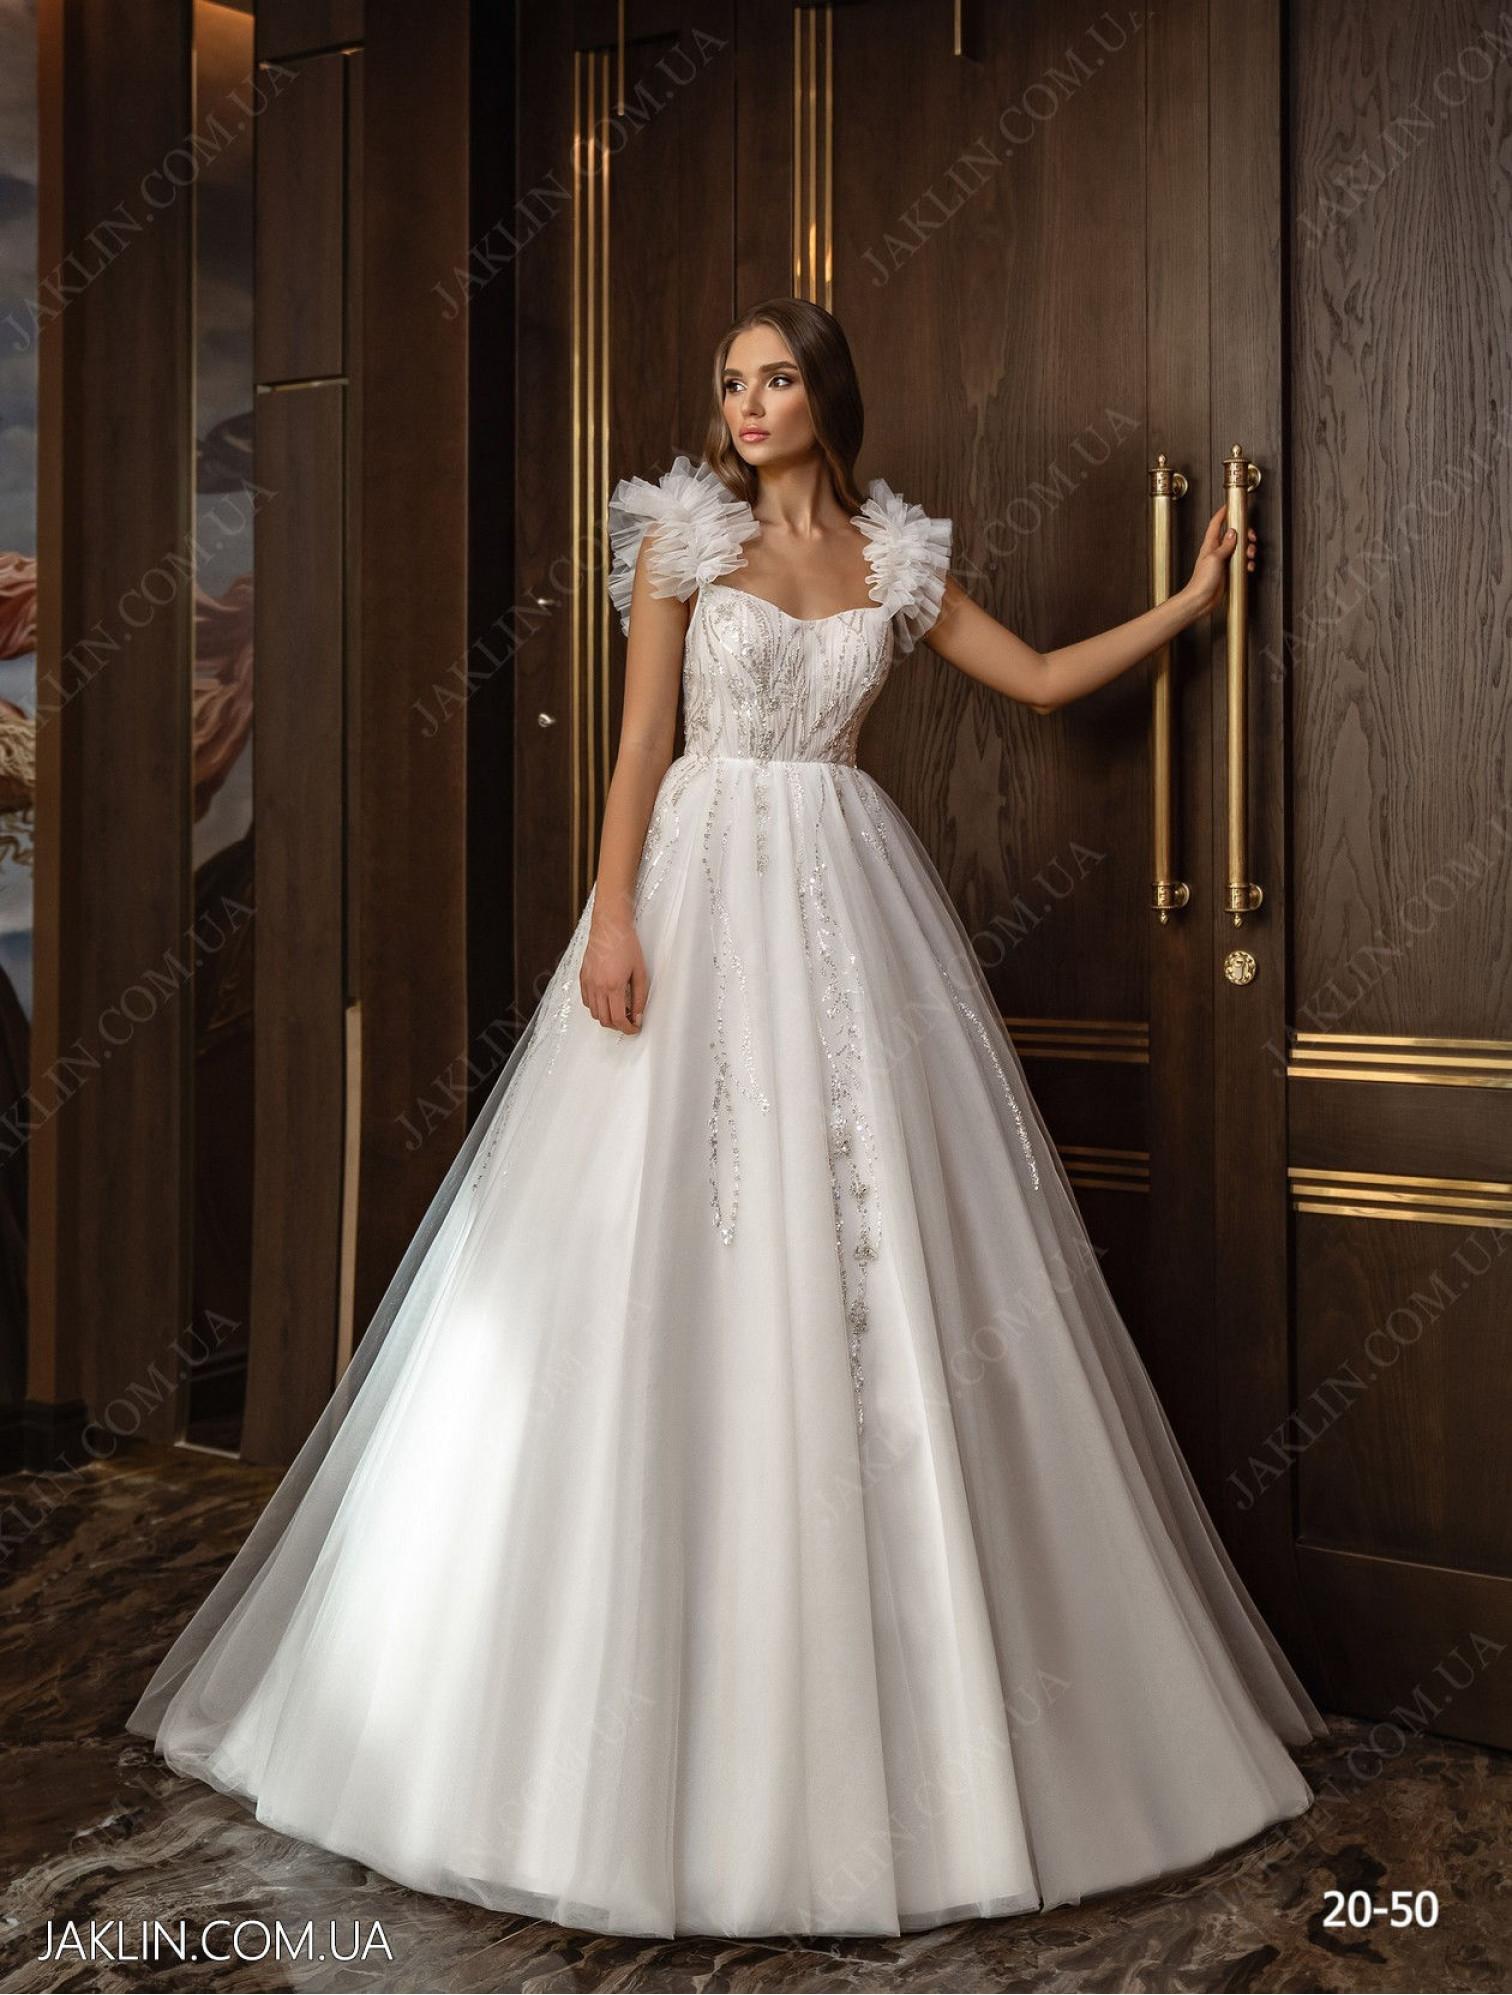 Wedding dress 20-50